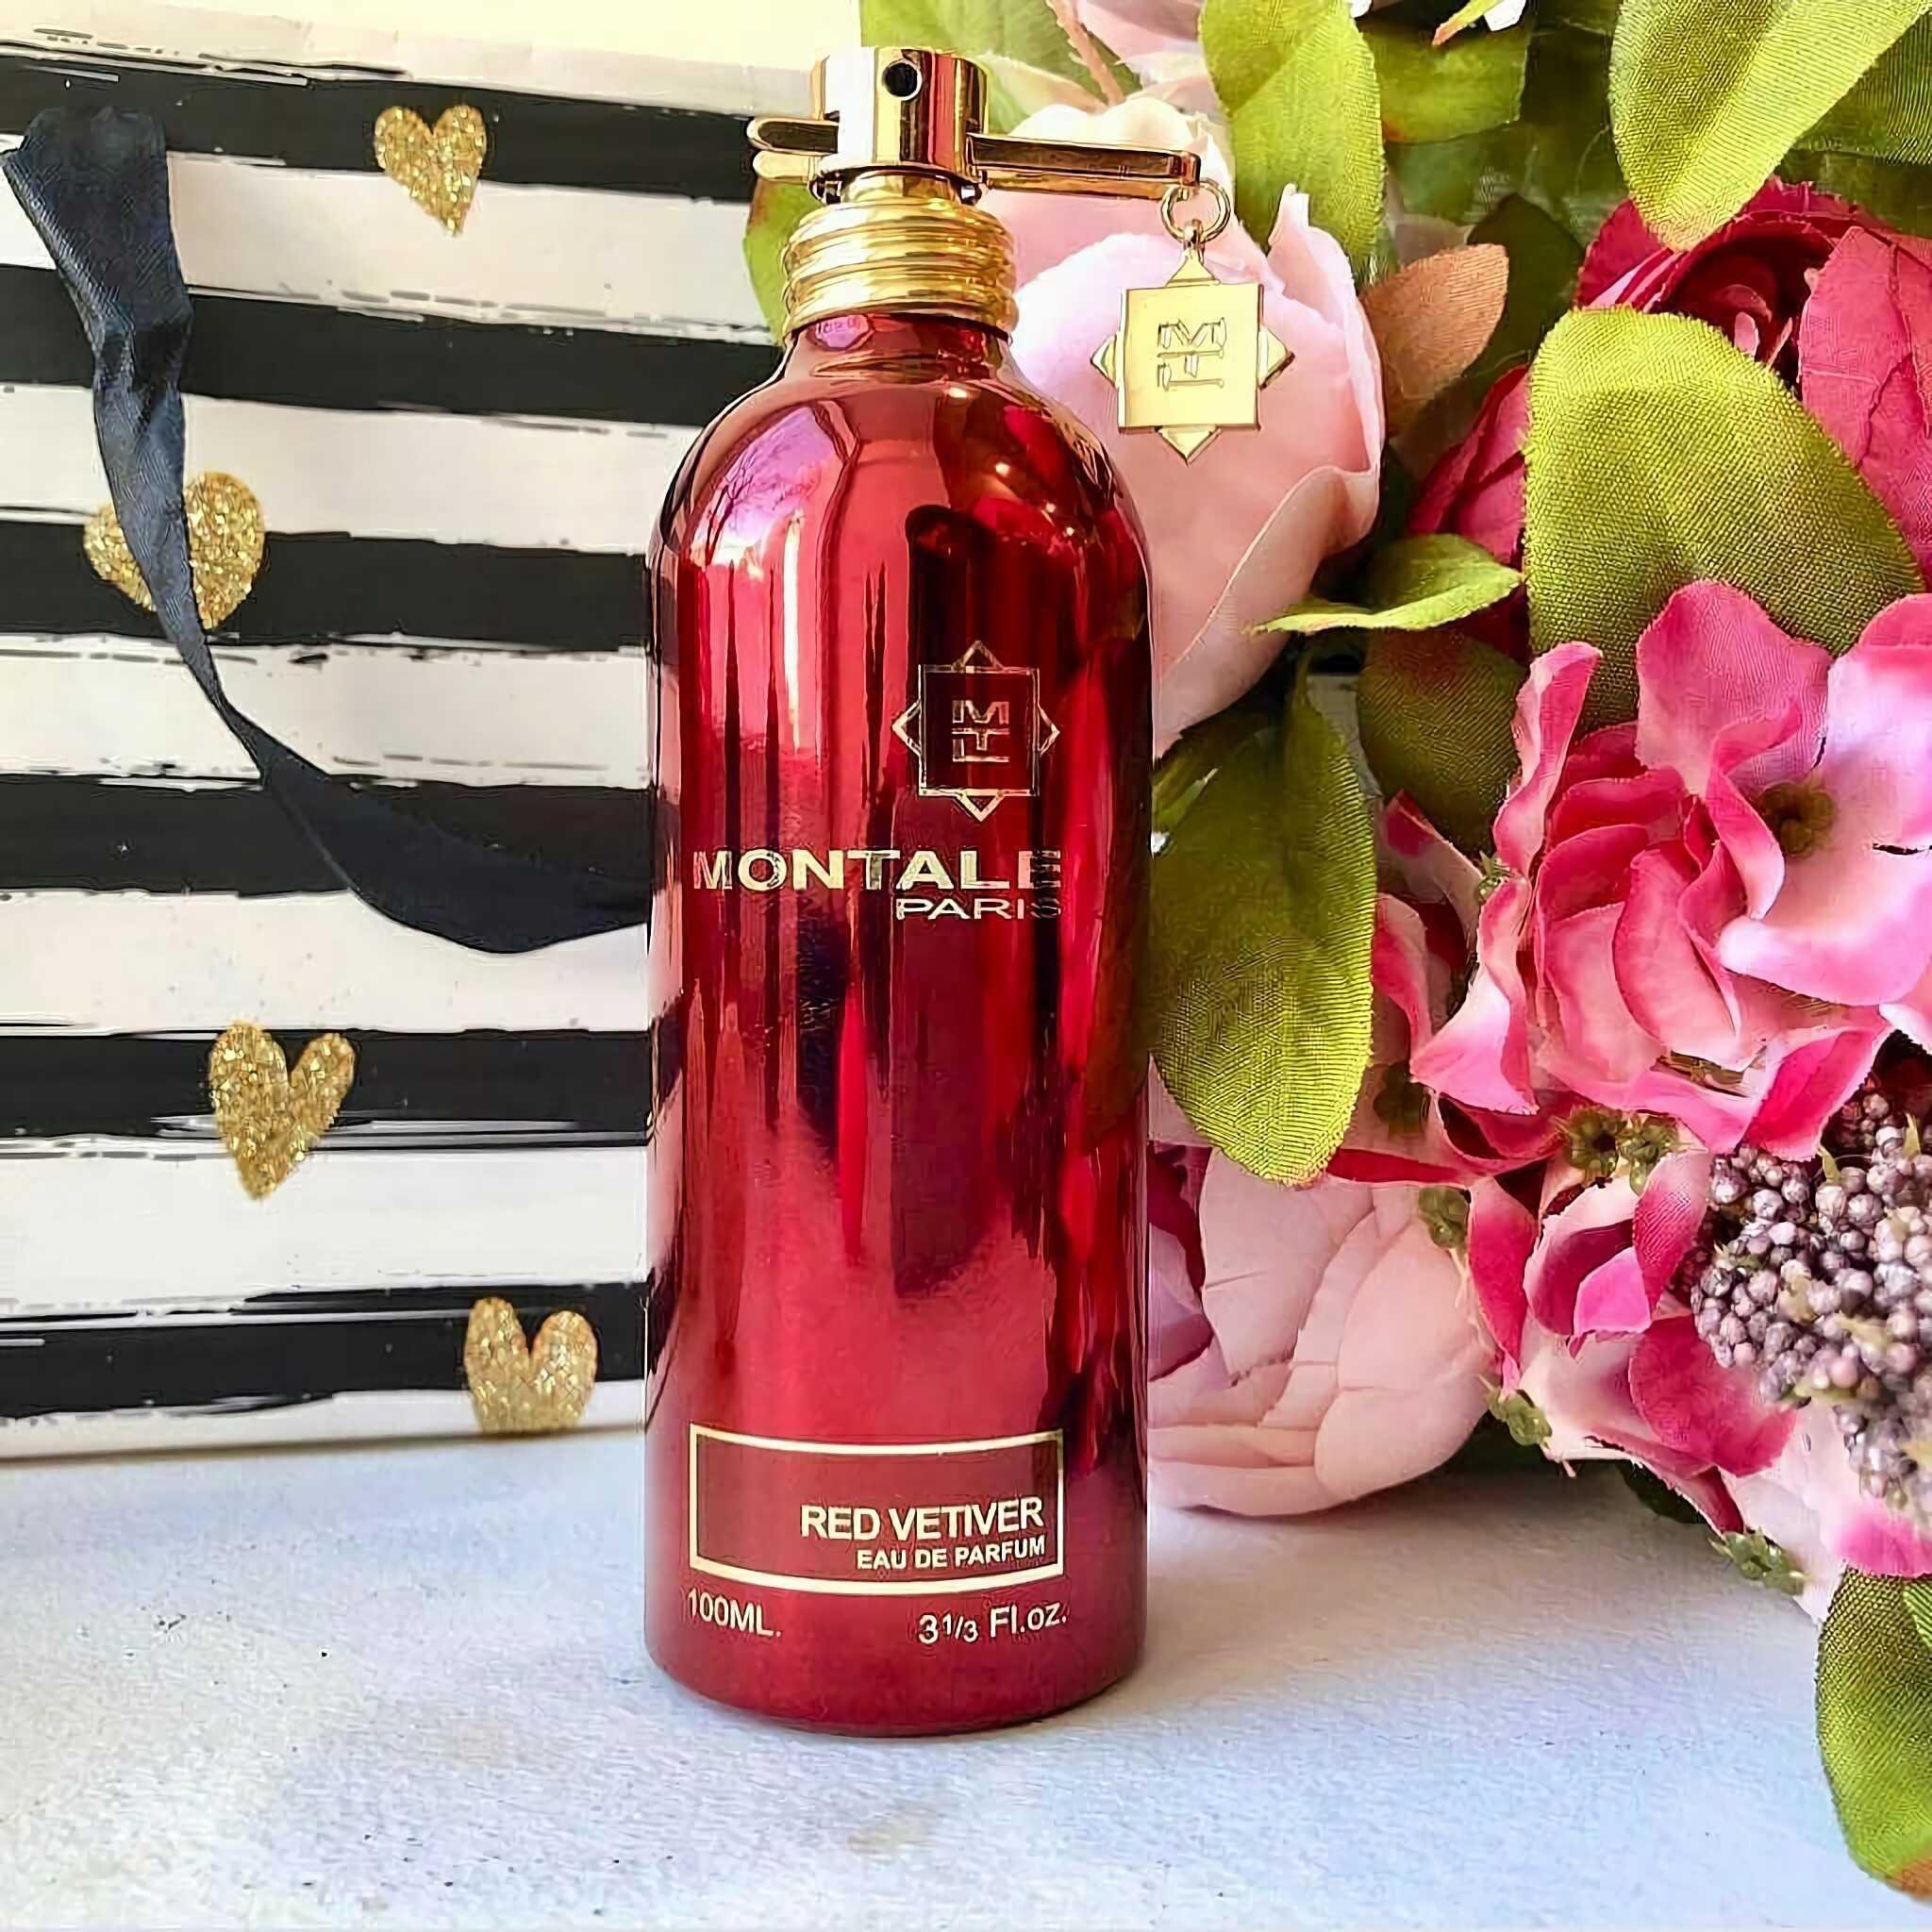 новая парфюмерная вода с древесным запахом Montale Red Vetyver